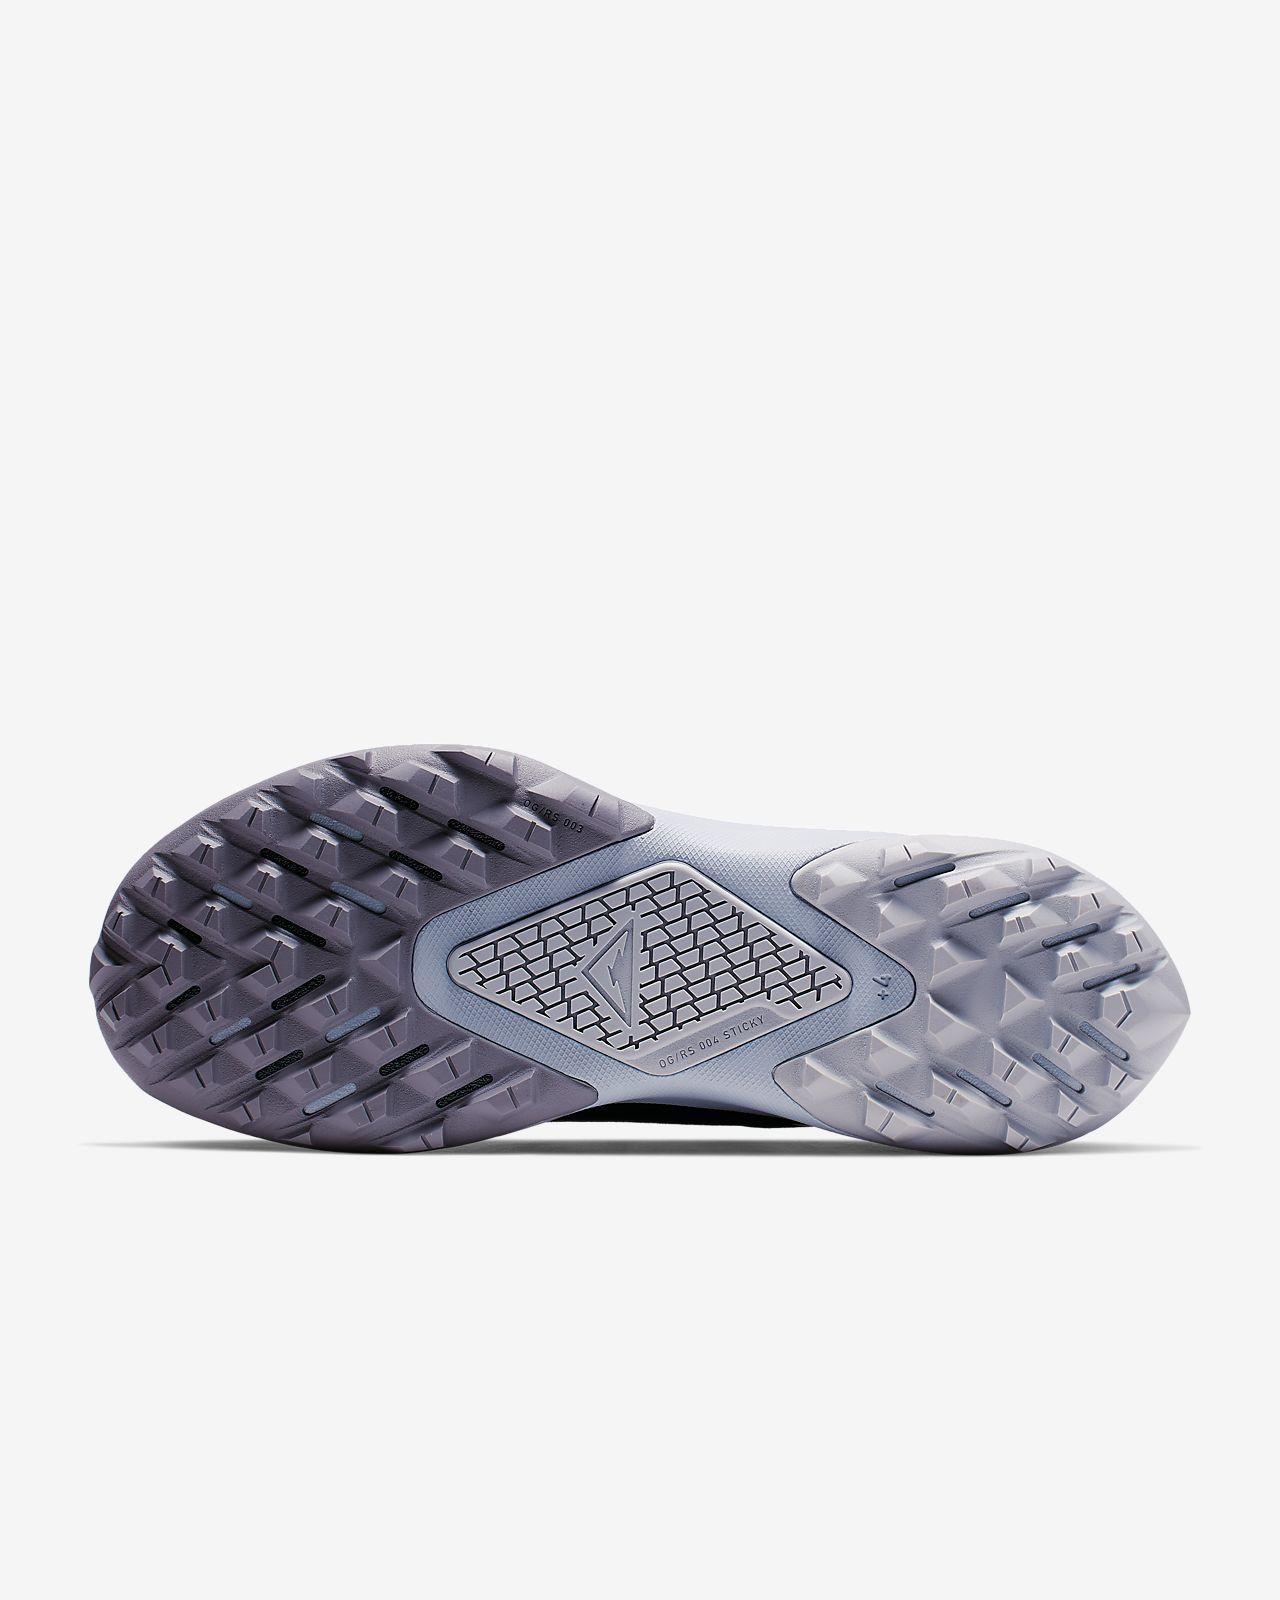 30f8713202579 Nike Air Zoom Terra Kiger 5 Zapatillas de running - Hombre. Nike.com ES